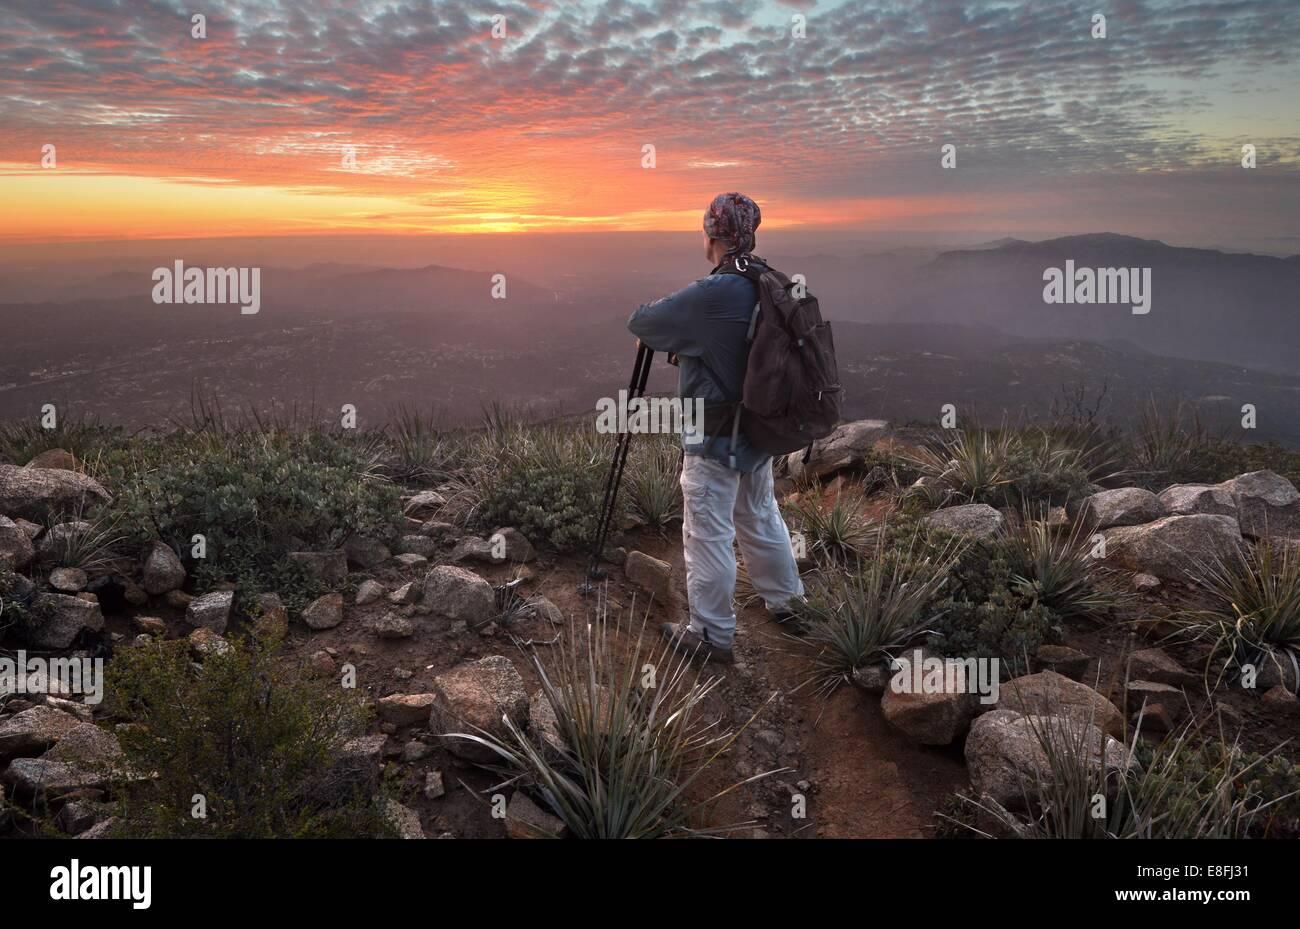 Hombre mirando a ver al atardecer, Cleveland National Forest, California, Estados Unidos, EE.UU. Imagen De Stock